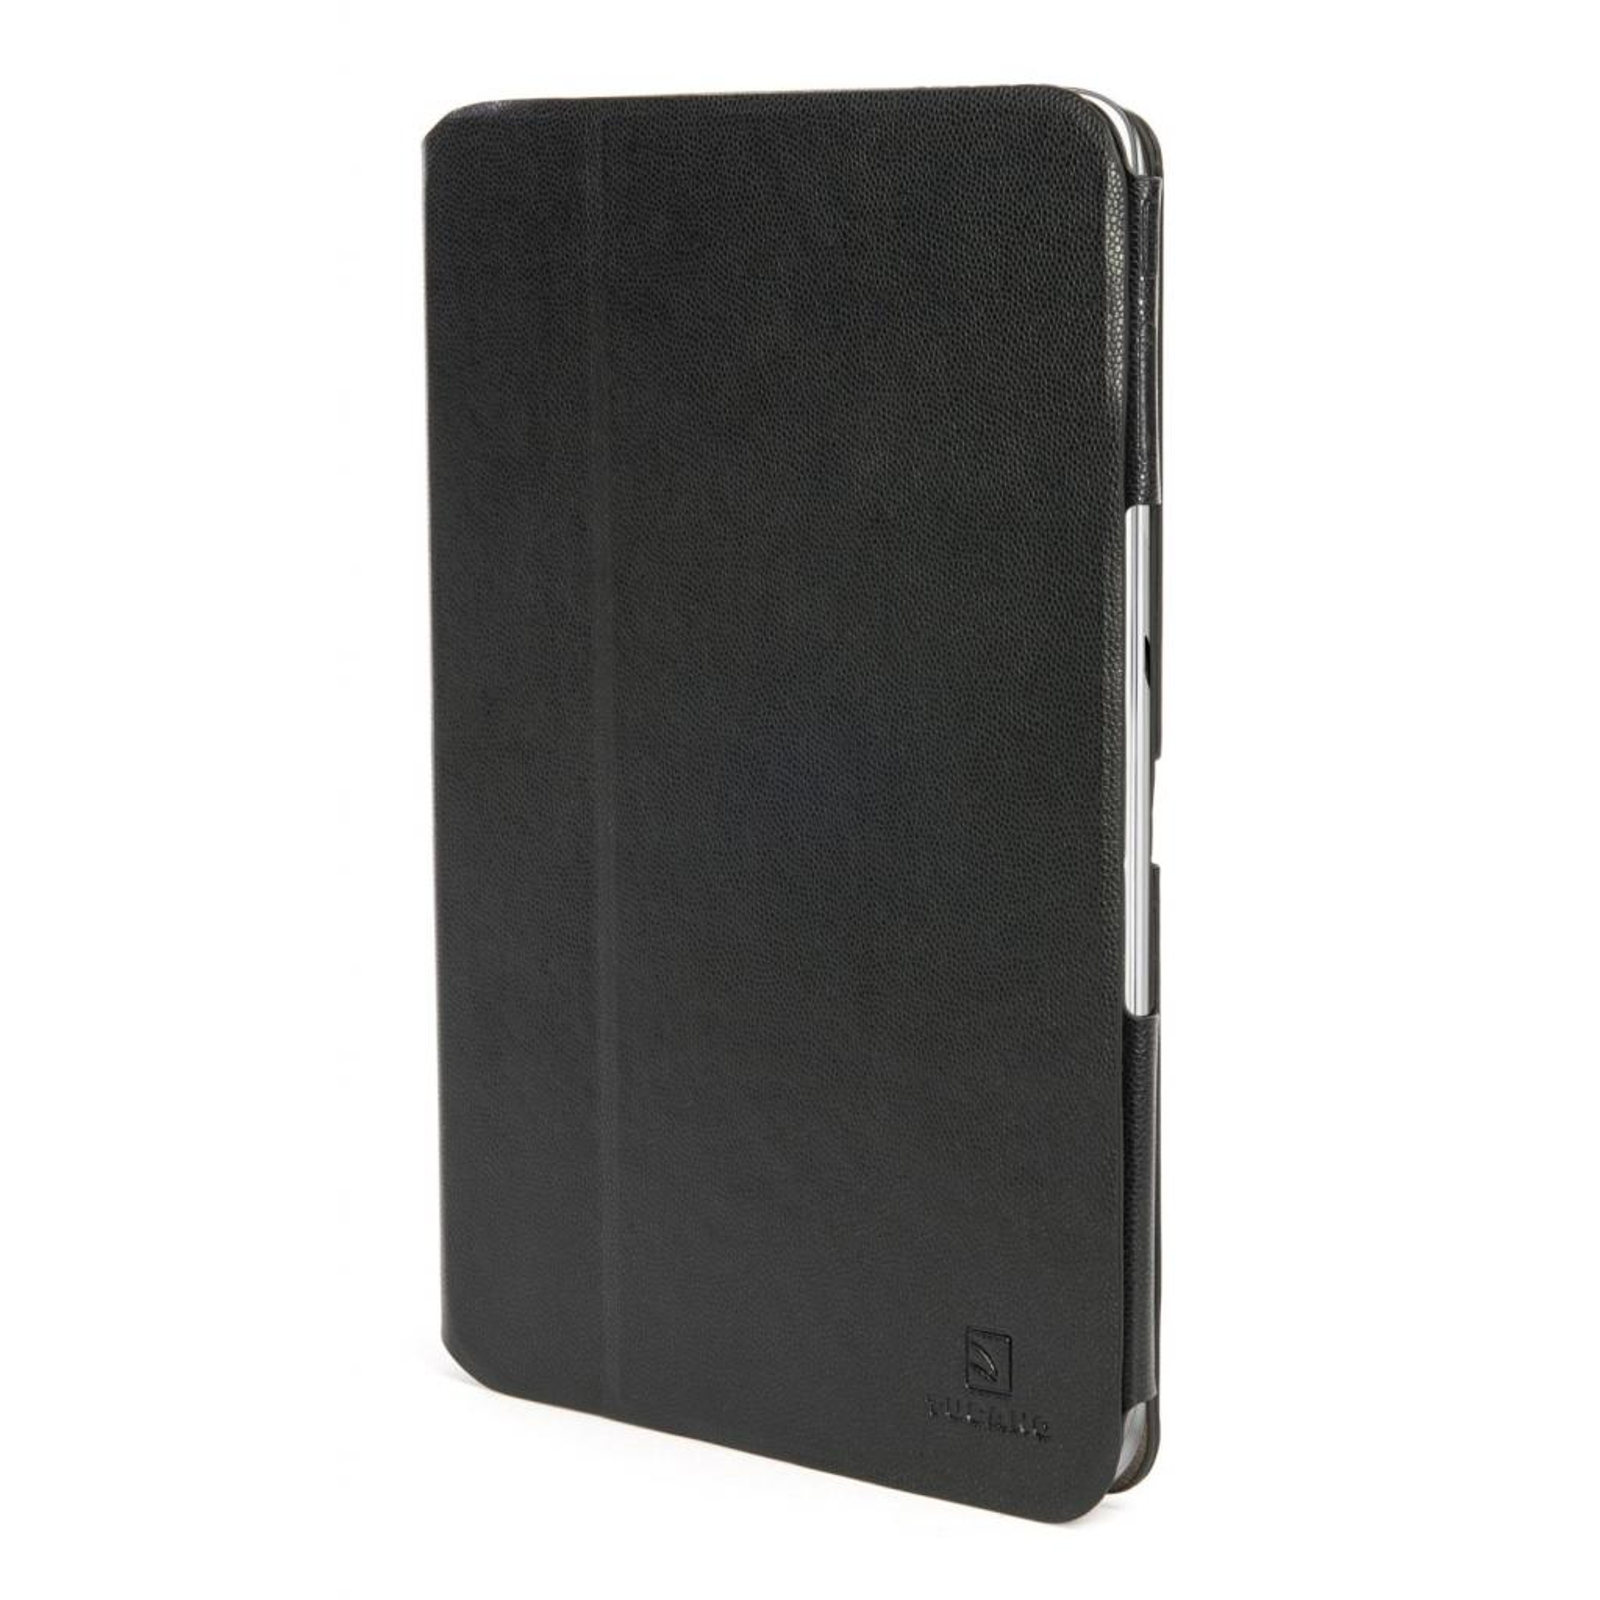 Чехол для планшета Tucano Galaxy Tab 3 10.1 Leggero Black (TAB-LS310) изображение 2